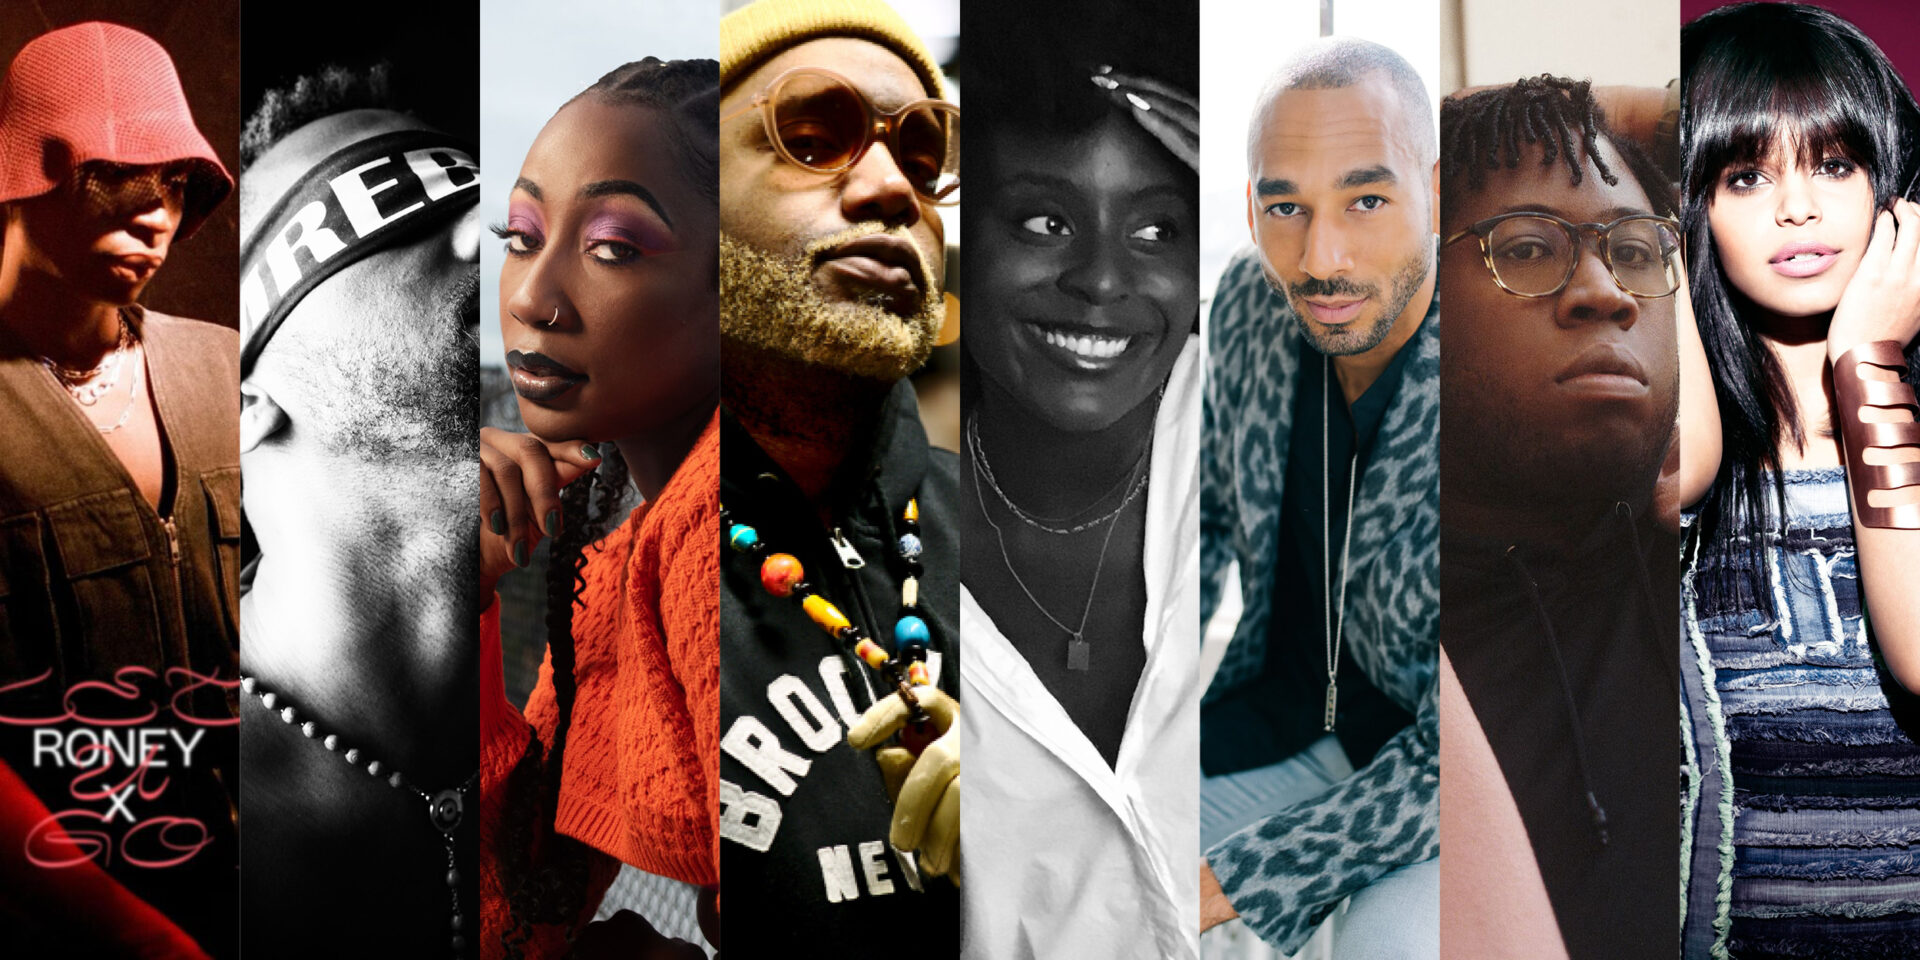 Roney X, IAMRebelWill, Sydanie, Jay Light, Kosa, Robert Ball ,Tafari Anthony, Fefe Dobson